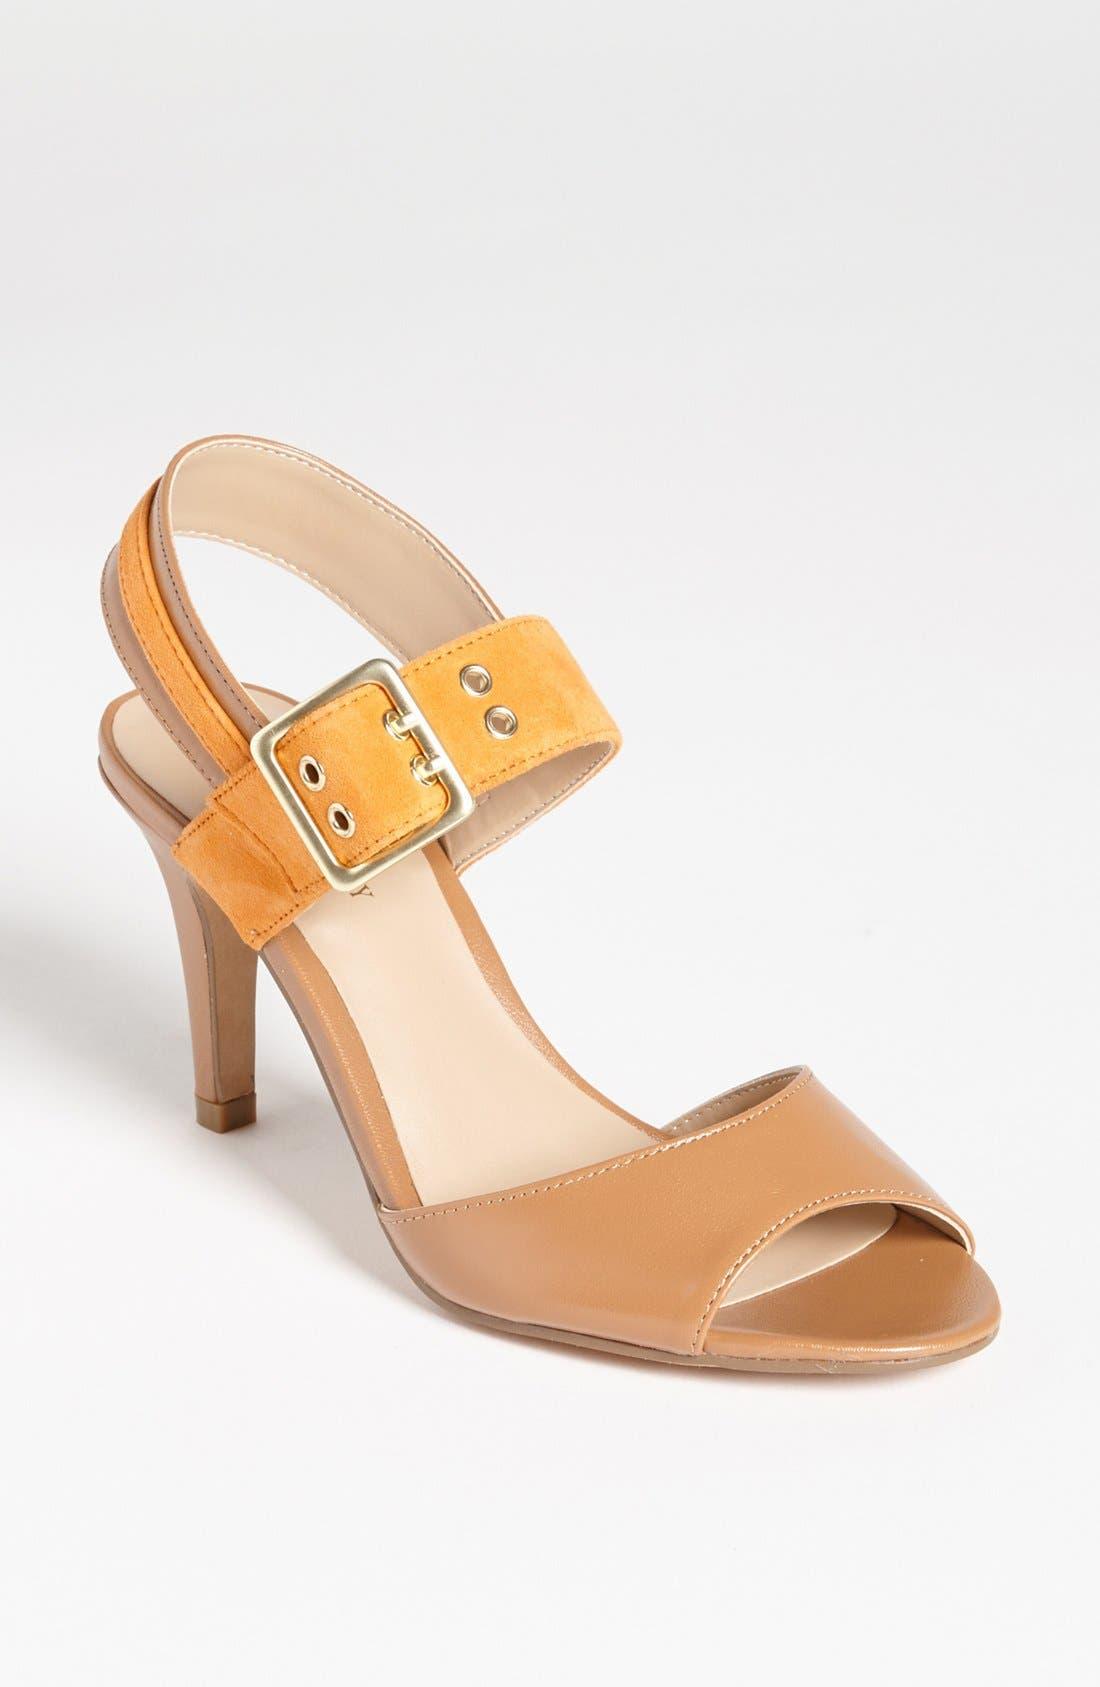 Alternate Image 1 Selected - Sole Society 'Tatiana' Sandal